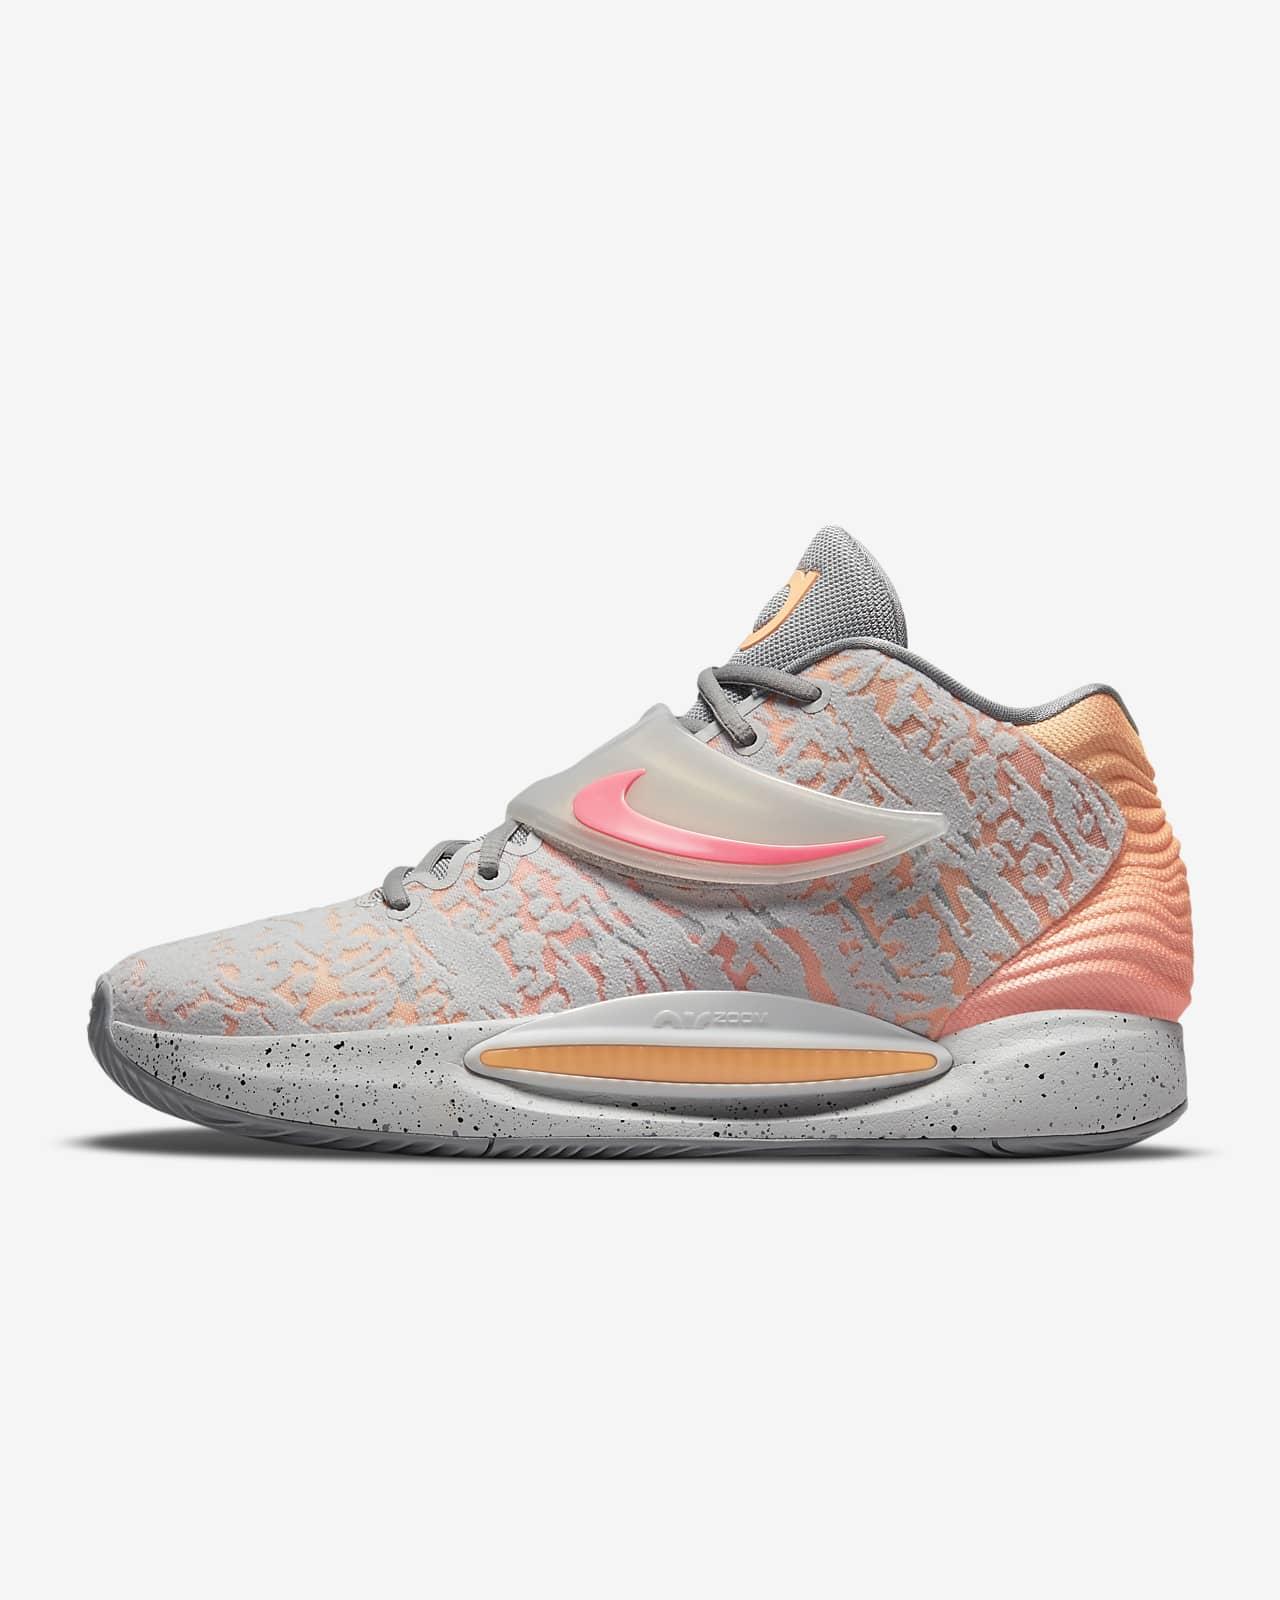 Nike KD14 'Sunrise'